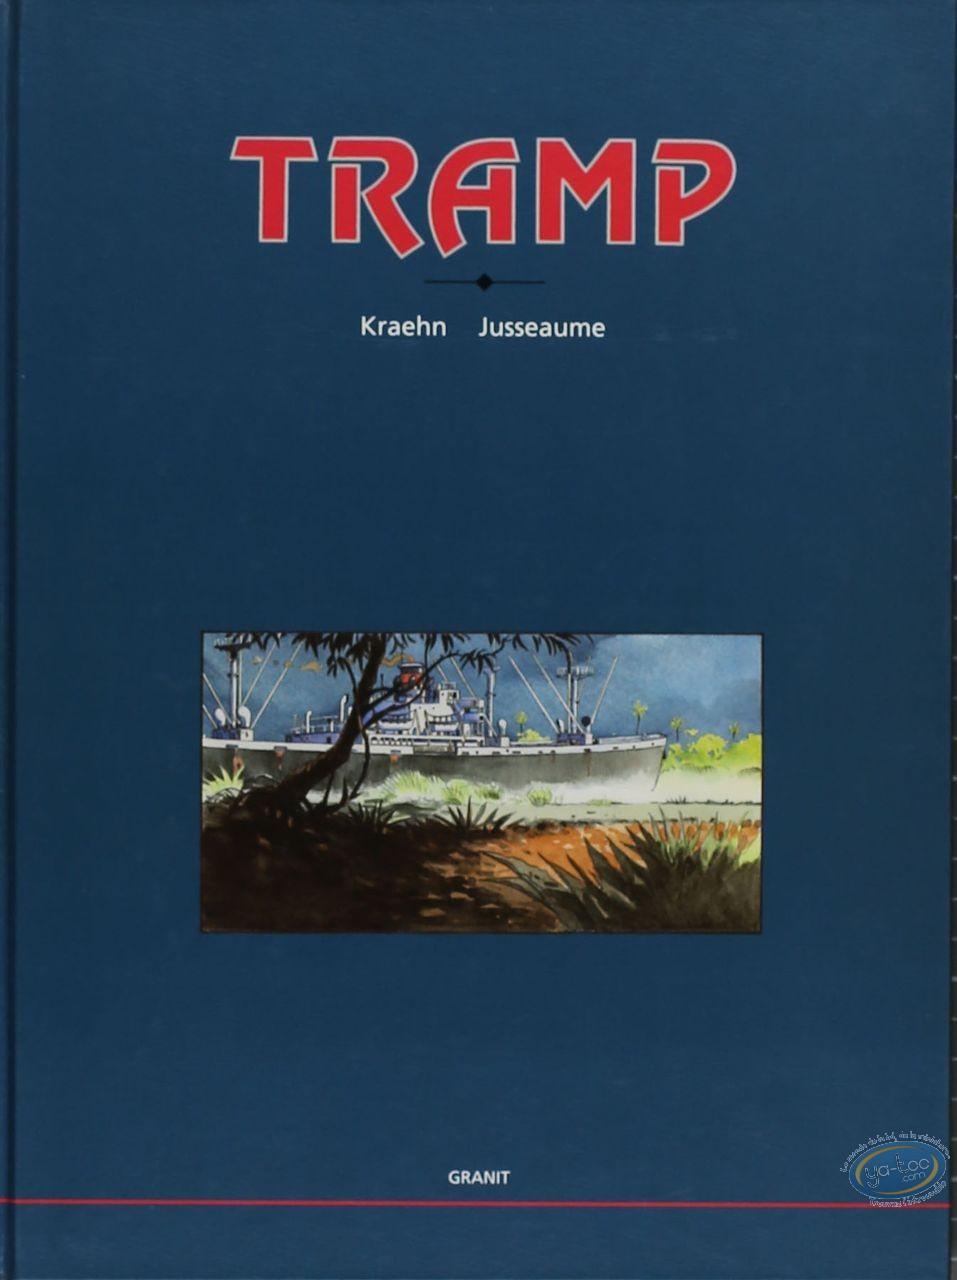 Limited First Edition, Tramp : Le bateau assassine